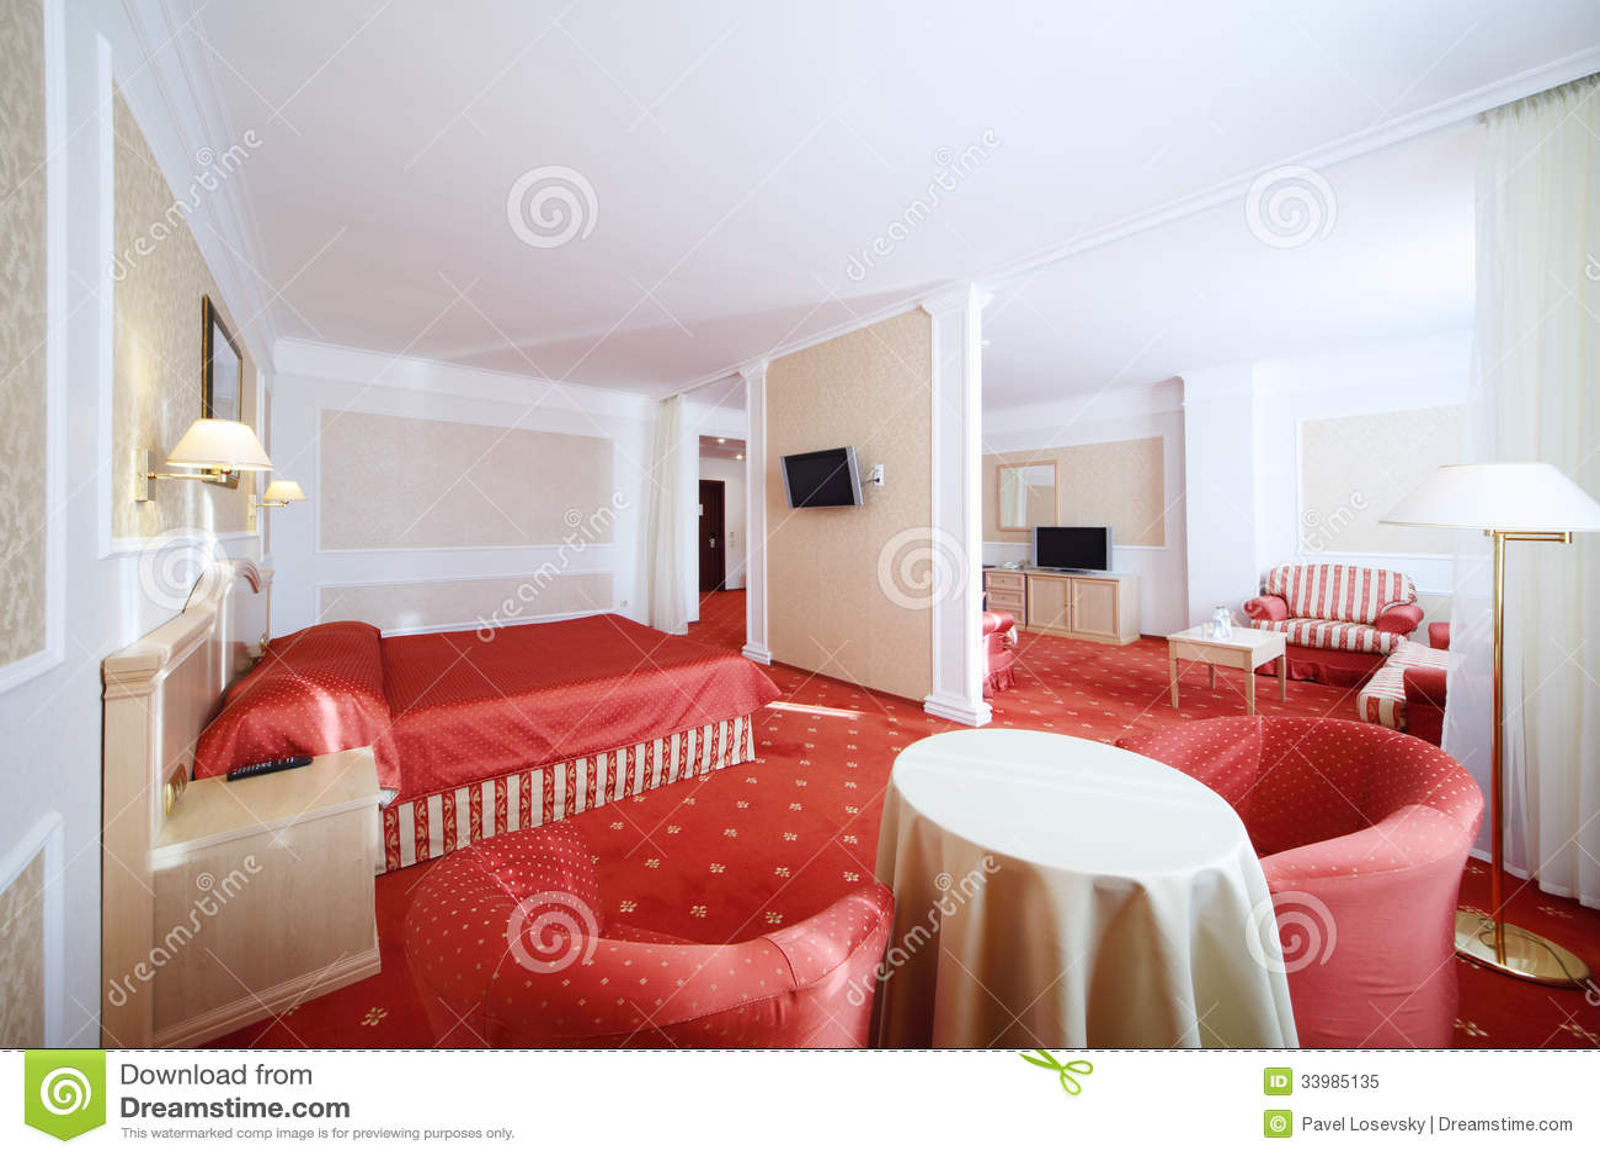 Slaapkamer met rood bed en woonkamer stock afbeelding for Slaapkamer bed